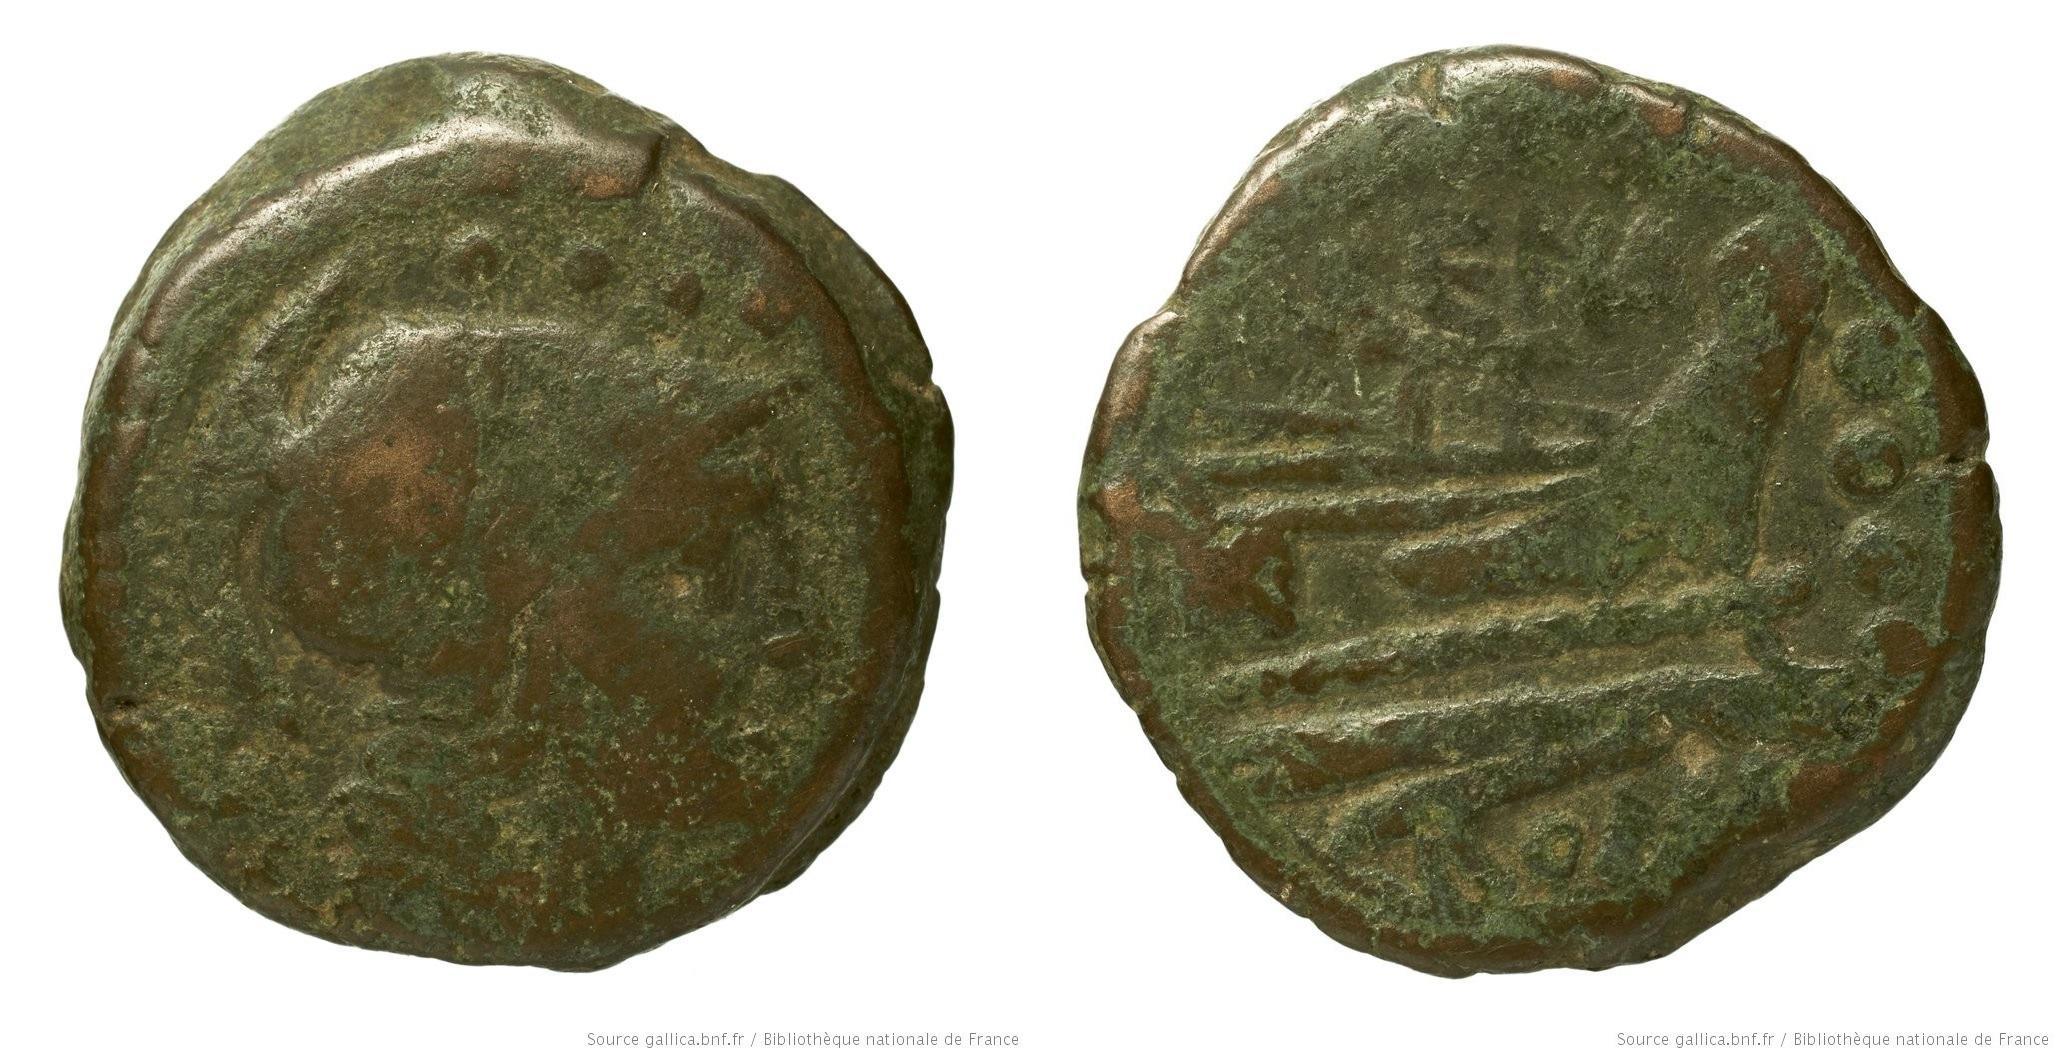 737LI – Triens Licinia – Licinius Murena